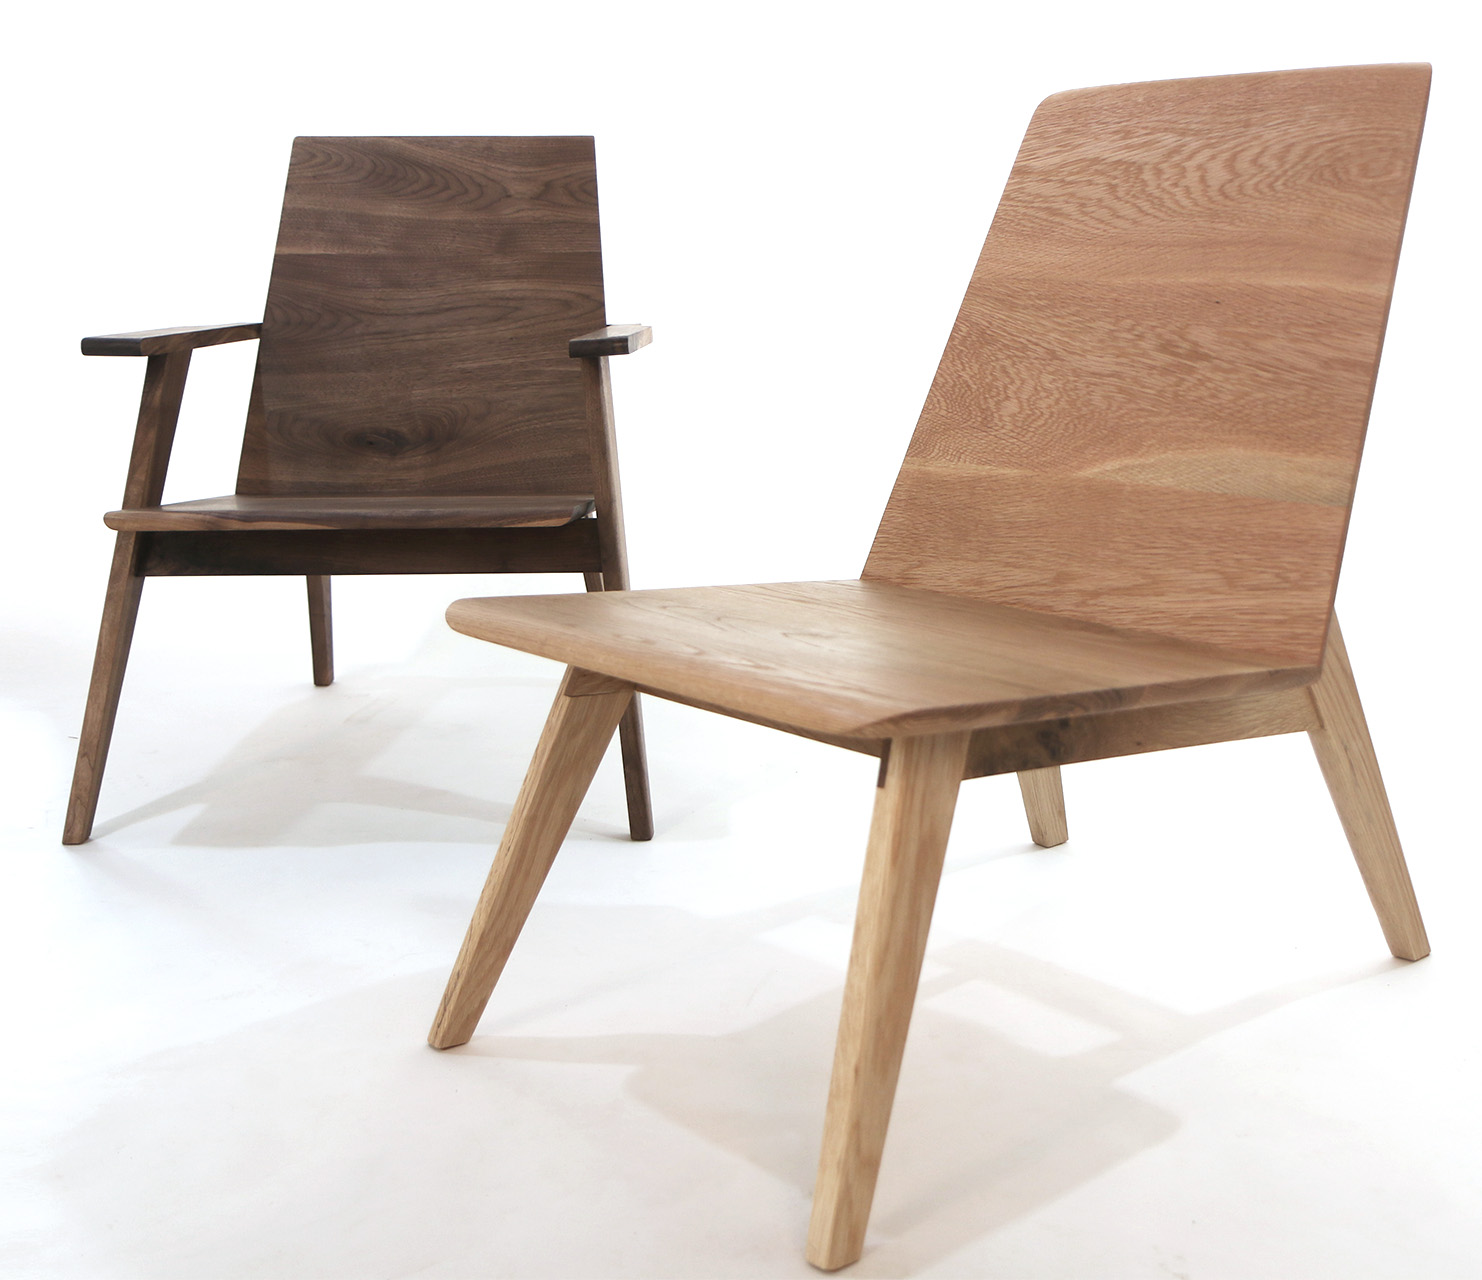 LOGGIA/Lounge chair